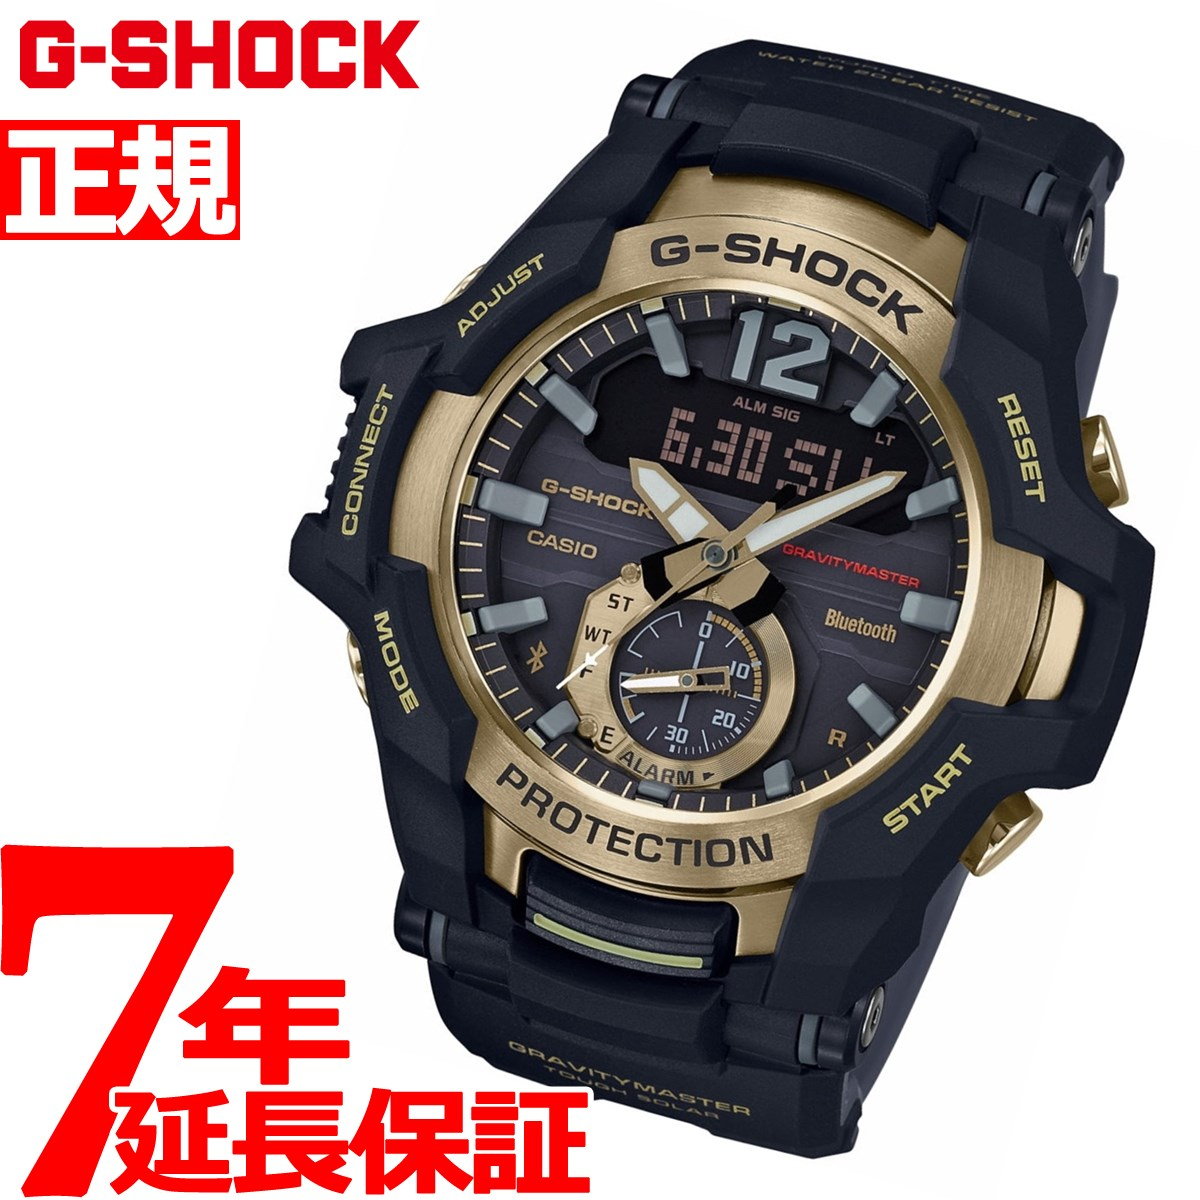 G-SHOCK Bluetooth 対応 ソーラー 腕時計 メンズ カシオ Gショック グラビティマスター CASIO ブラック MASTER OF G GR-B100GB-1AJF【2018 新作】